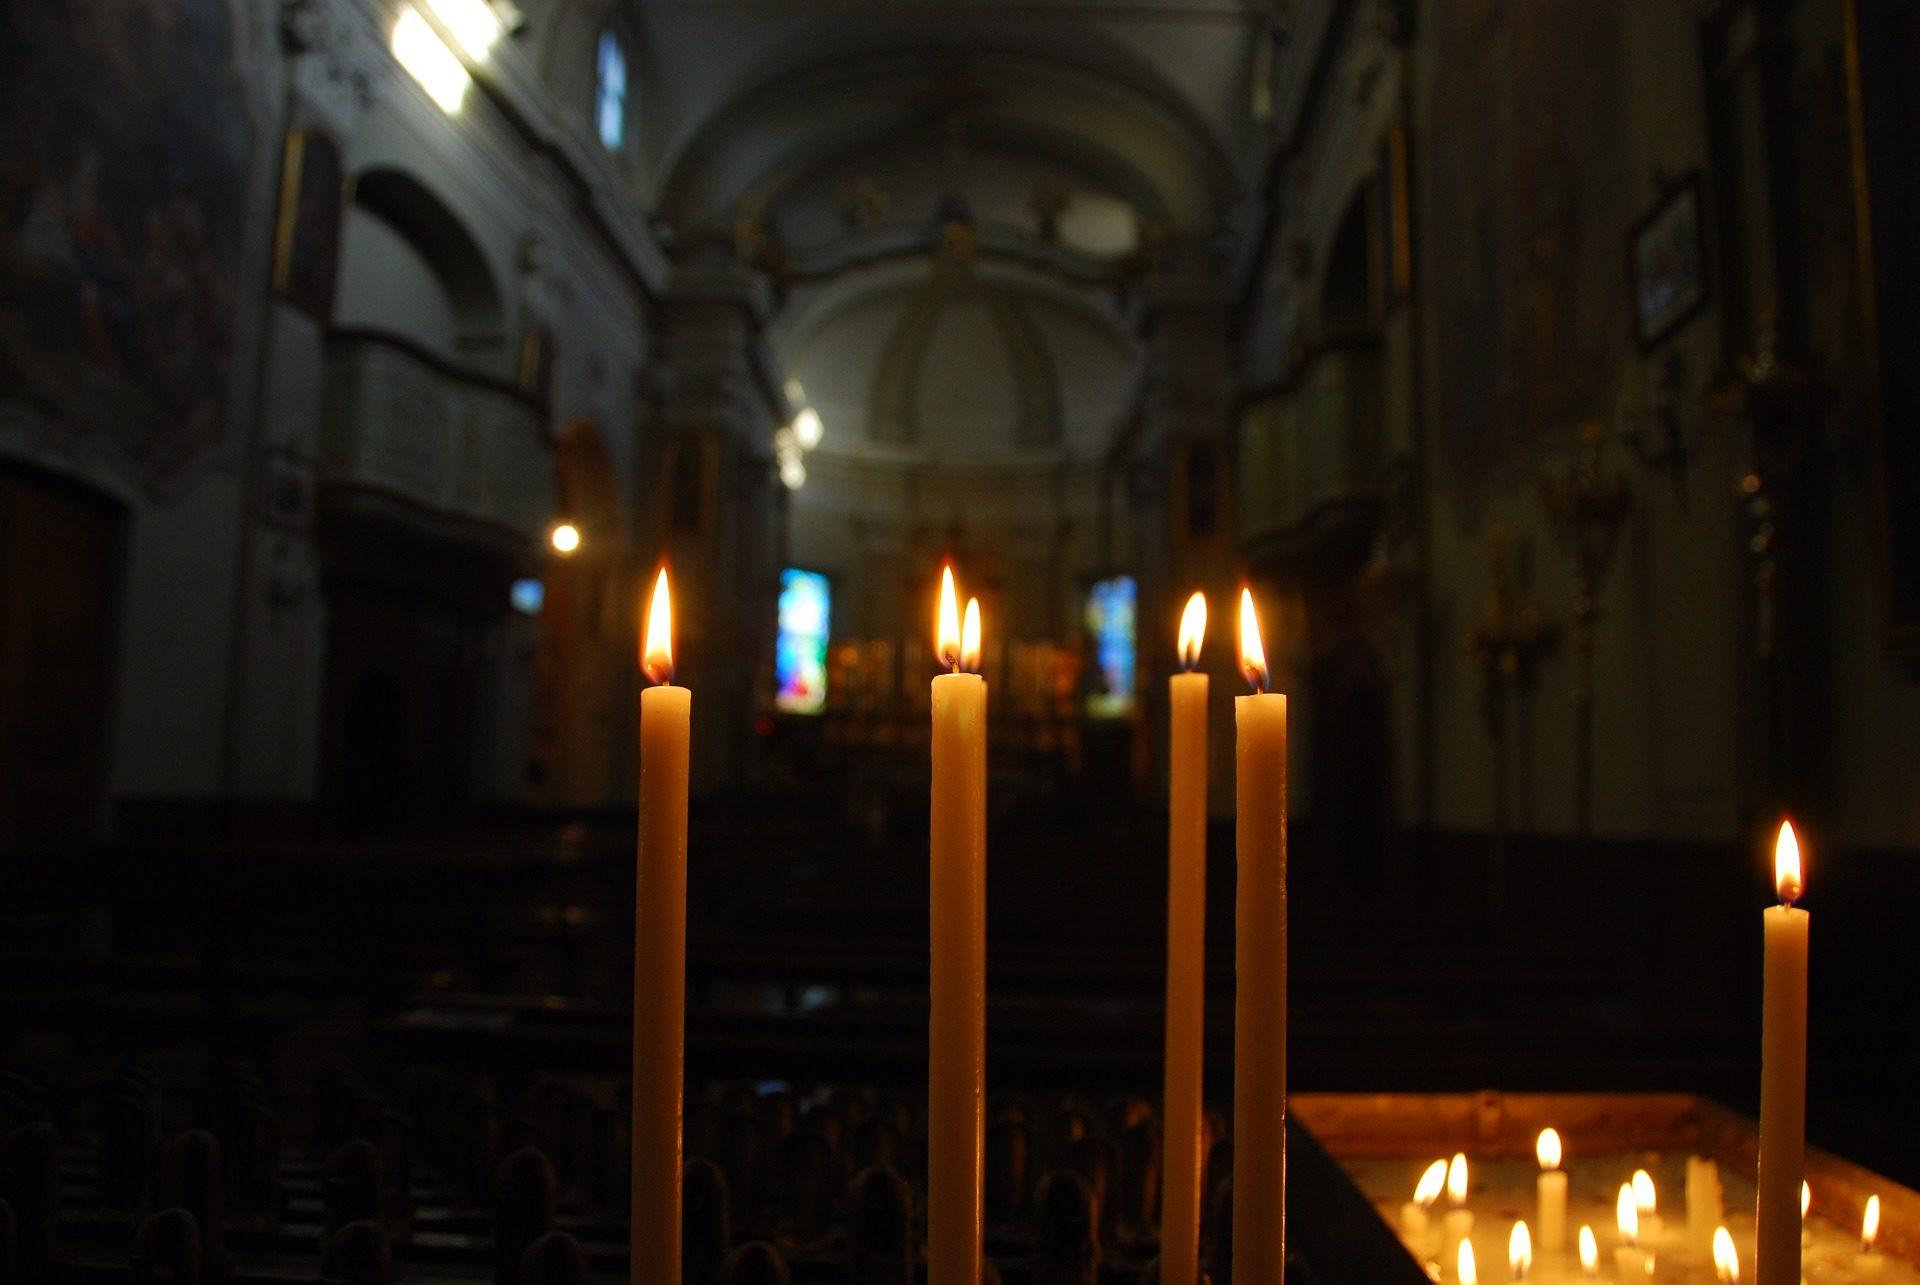 velas, iglesia, templo, oración, luz, llama - Fondos de Pantalla HD - professor-falken.com